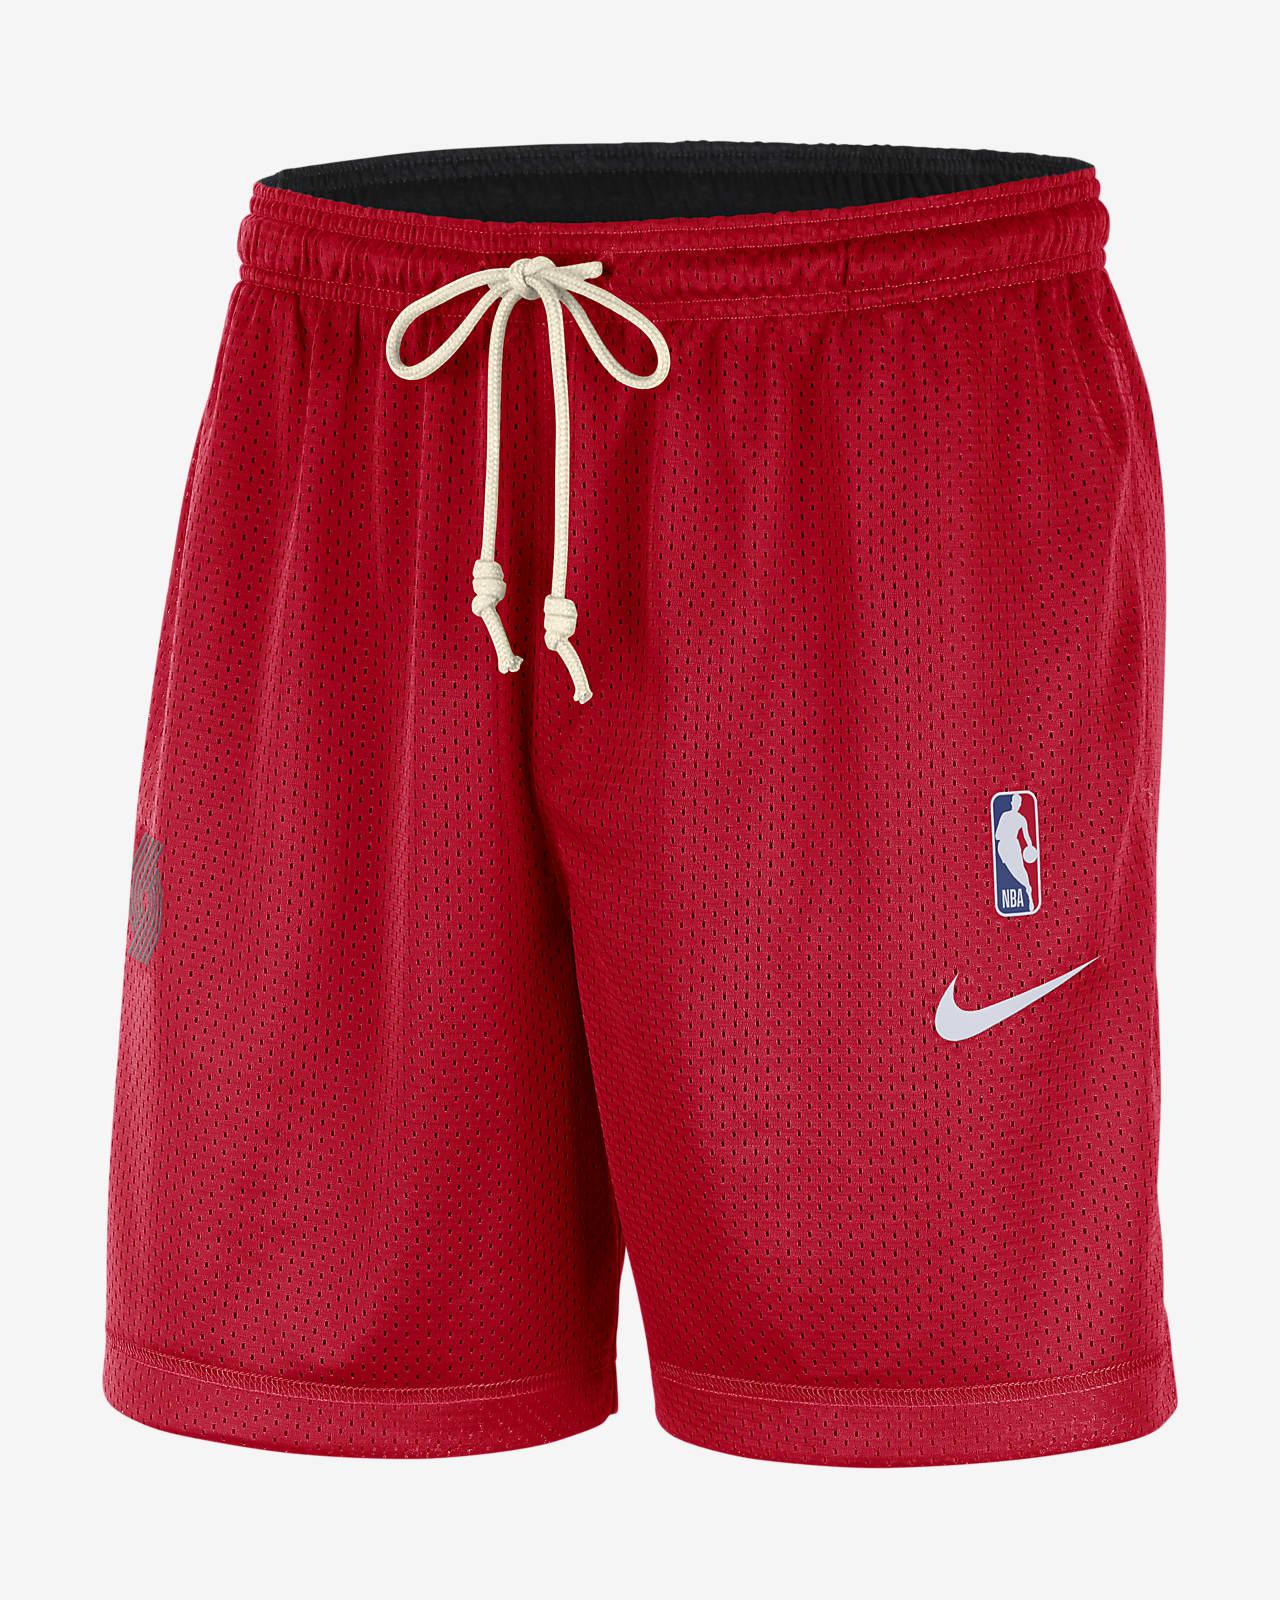 Trail Blazers Standard Issue Men's Nike NBA Reversible Shorts